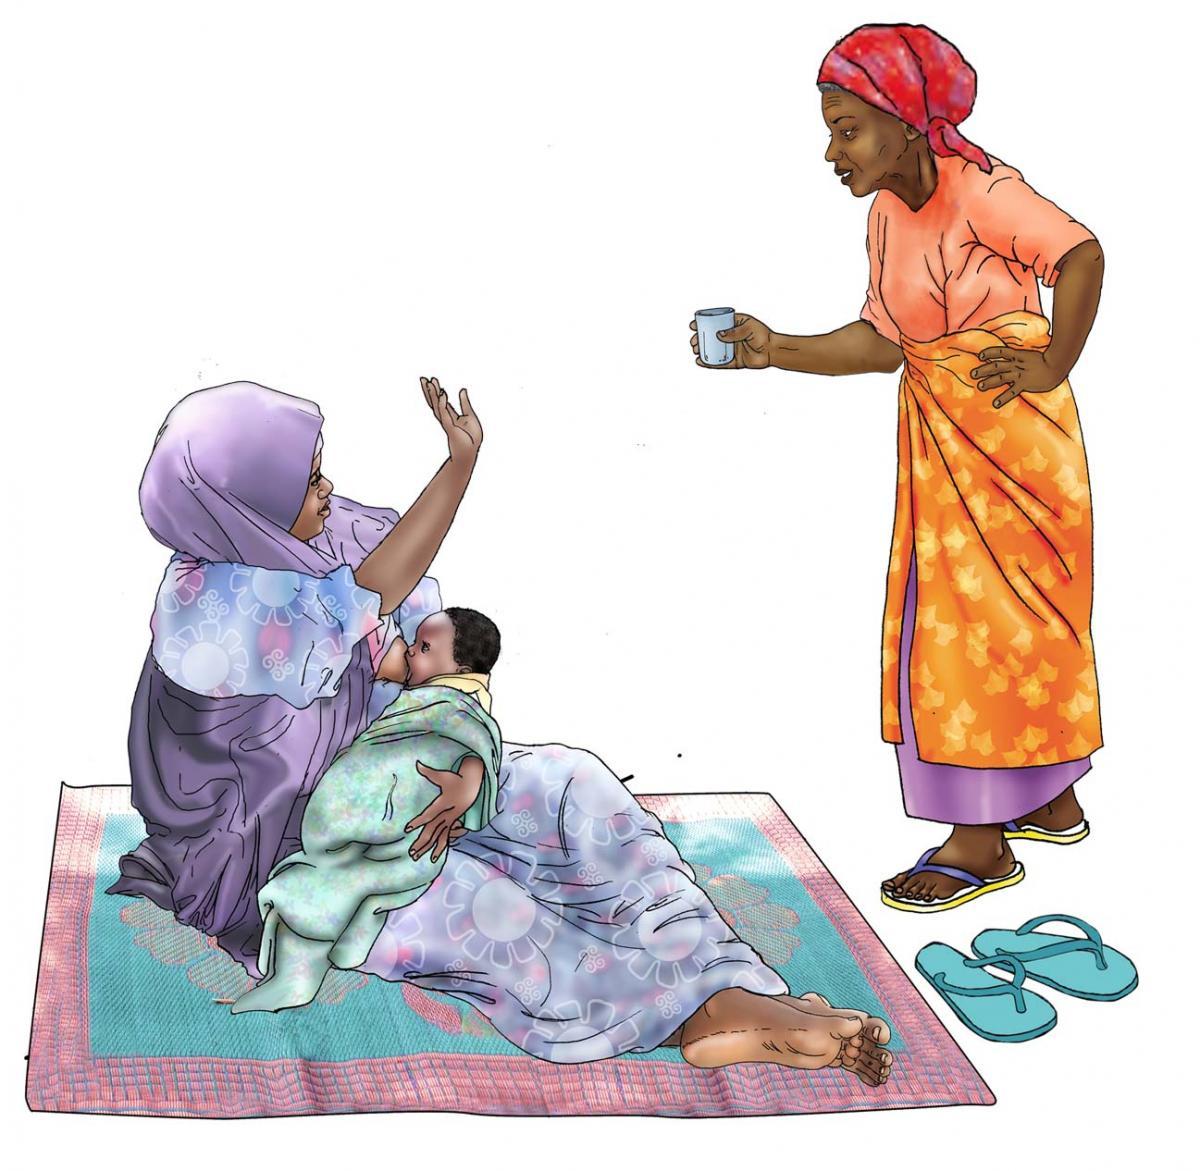 Breastfeeding - No water during breastfeeding 0-6 mo - 03 - Niger